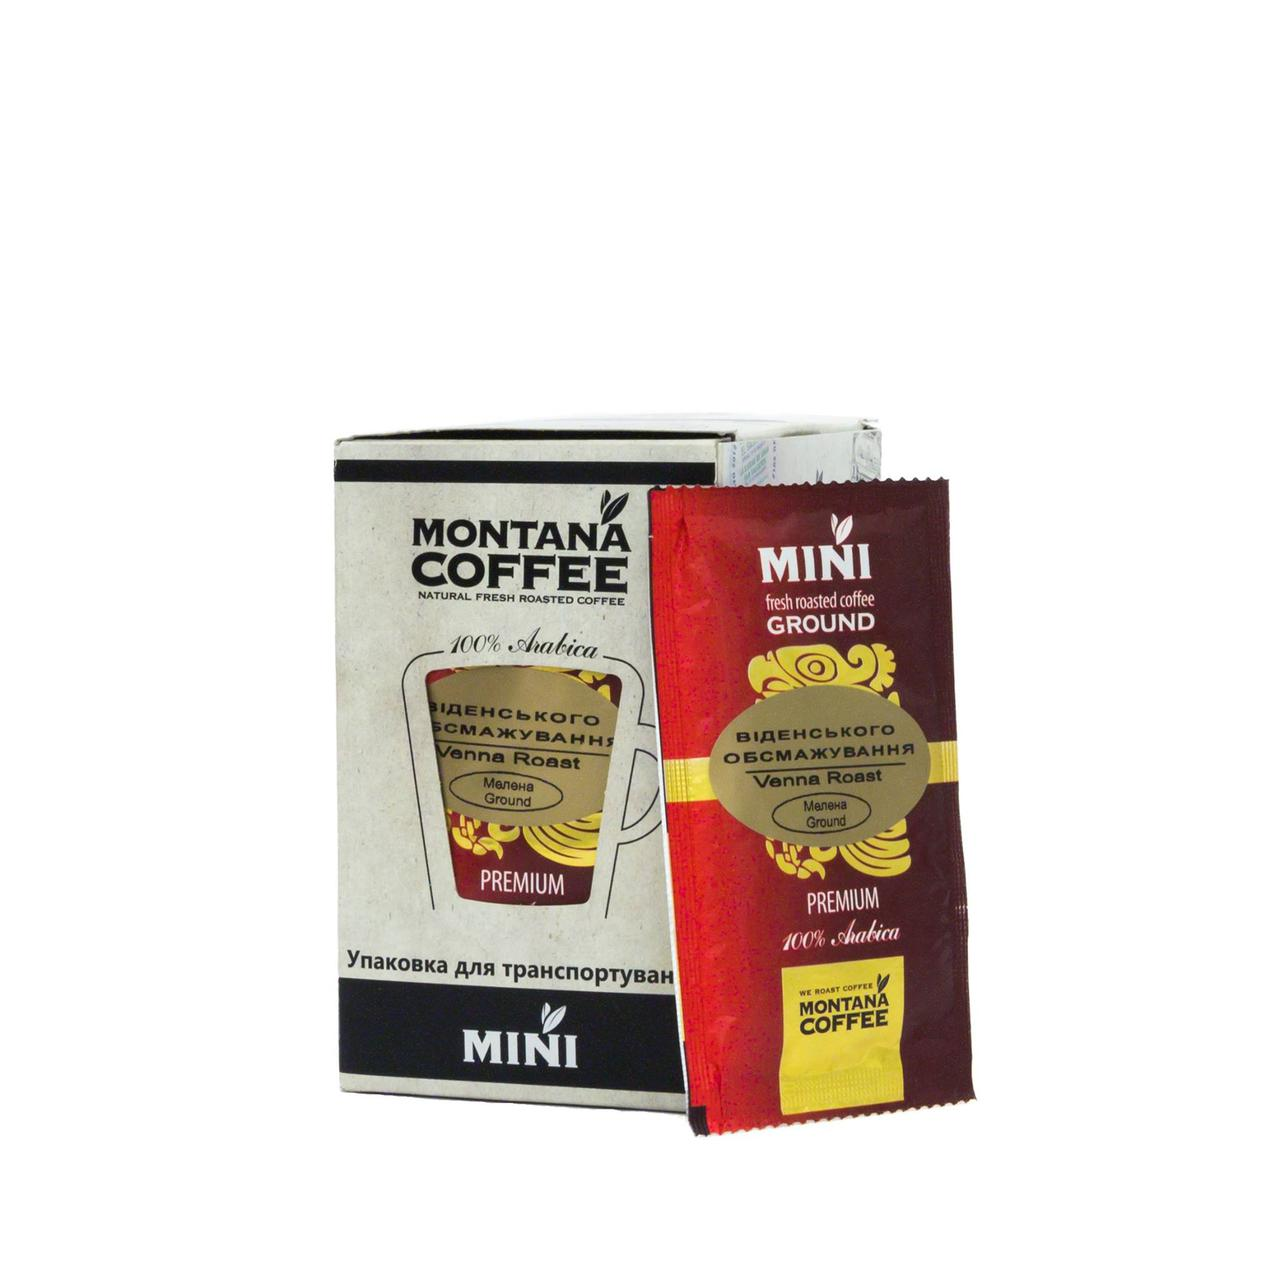 Венская обжарка Montana coffee MINI 20 шт